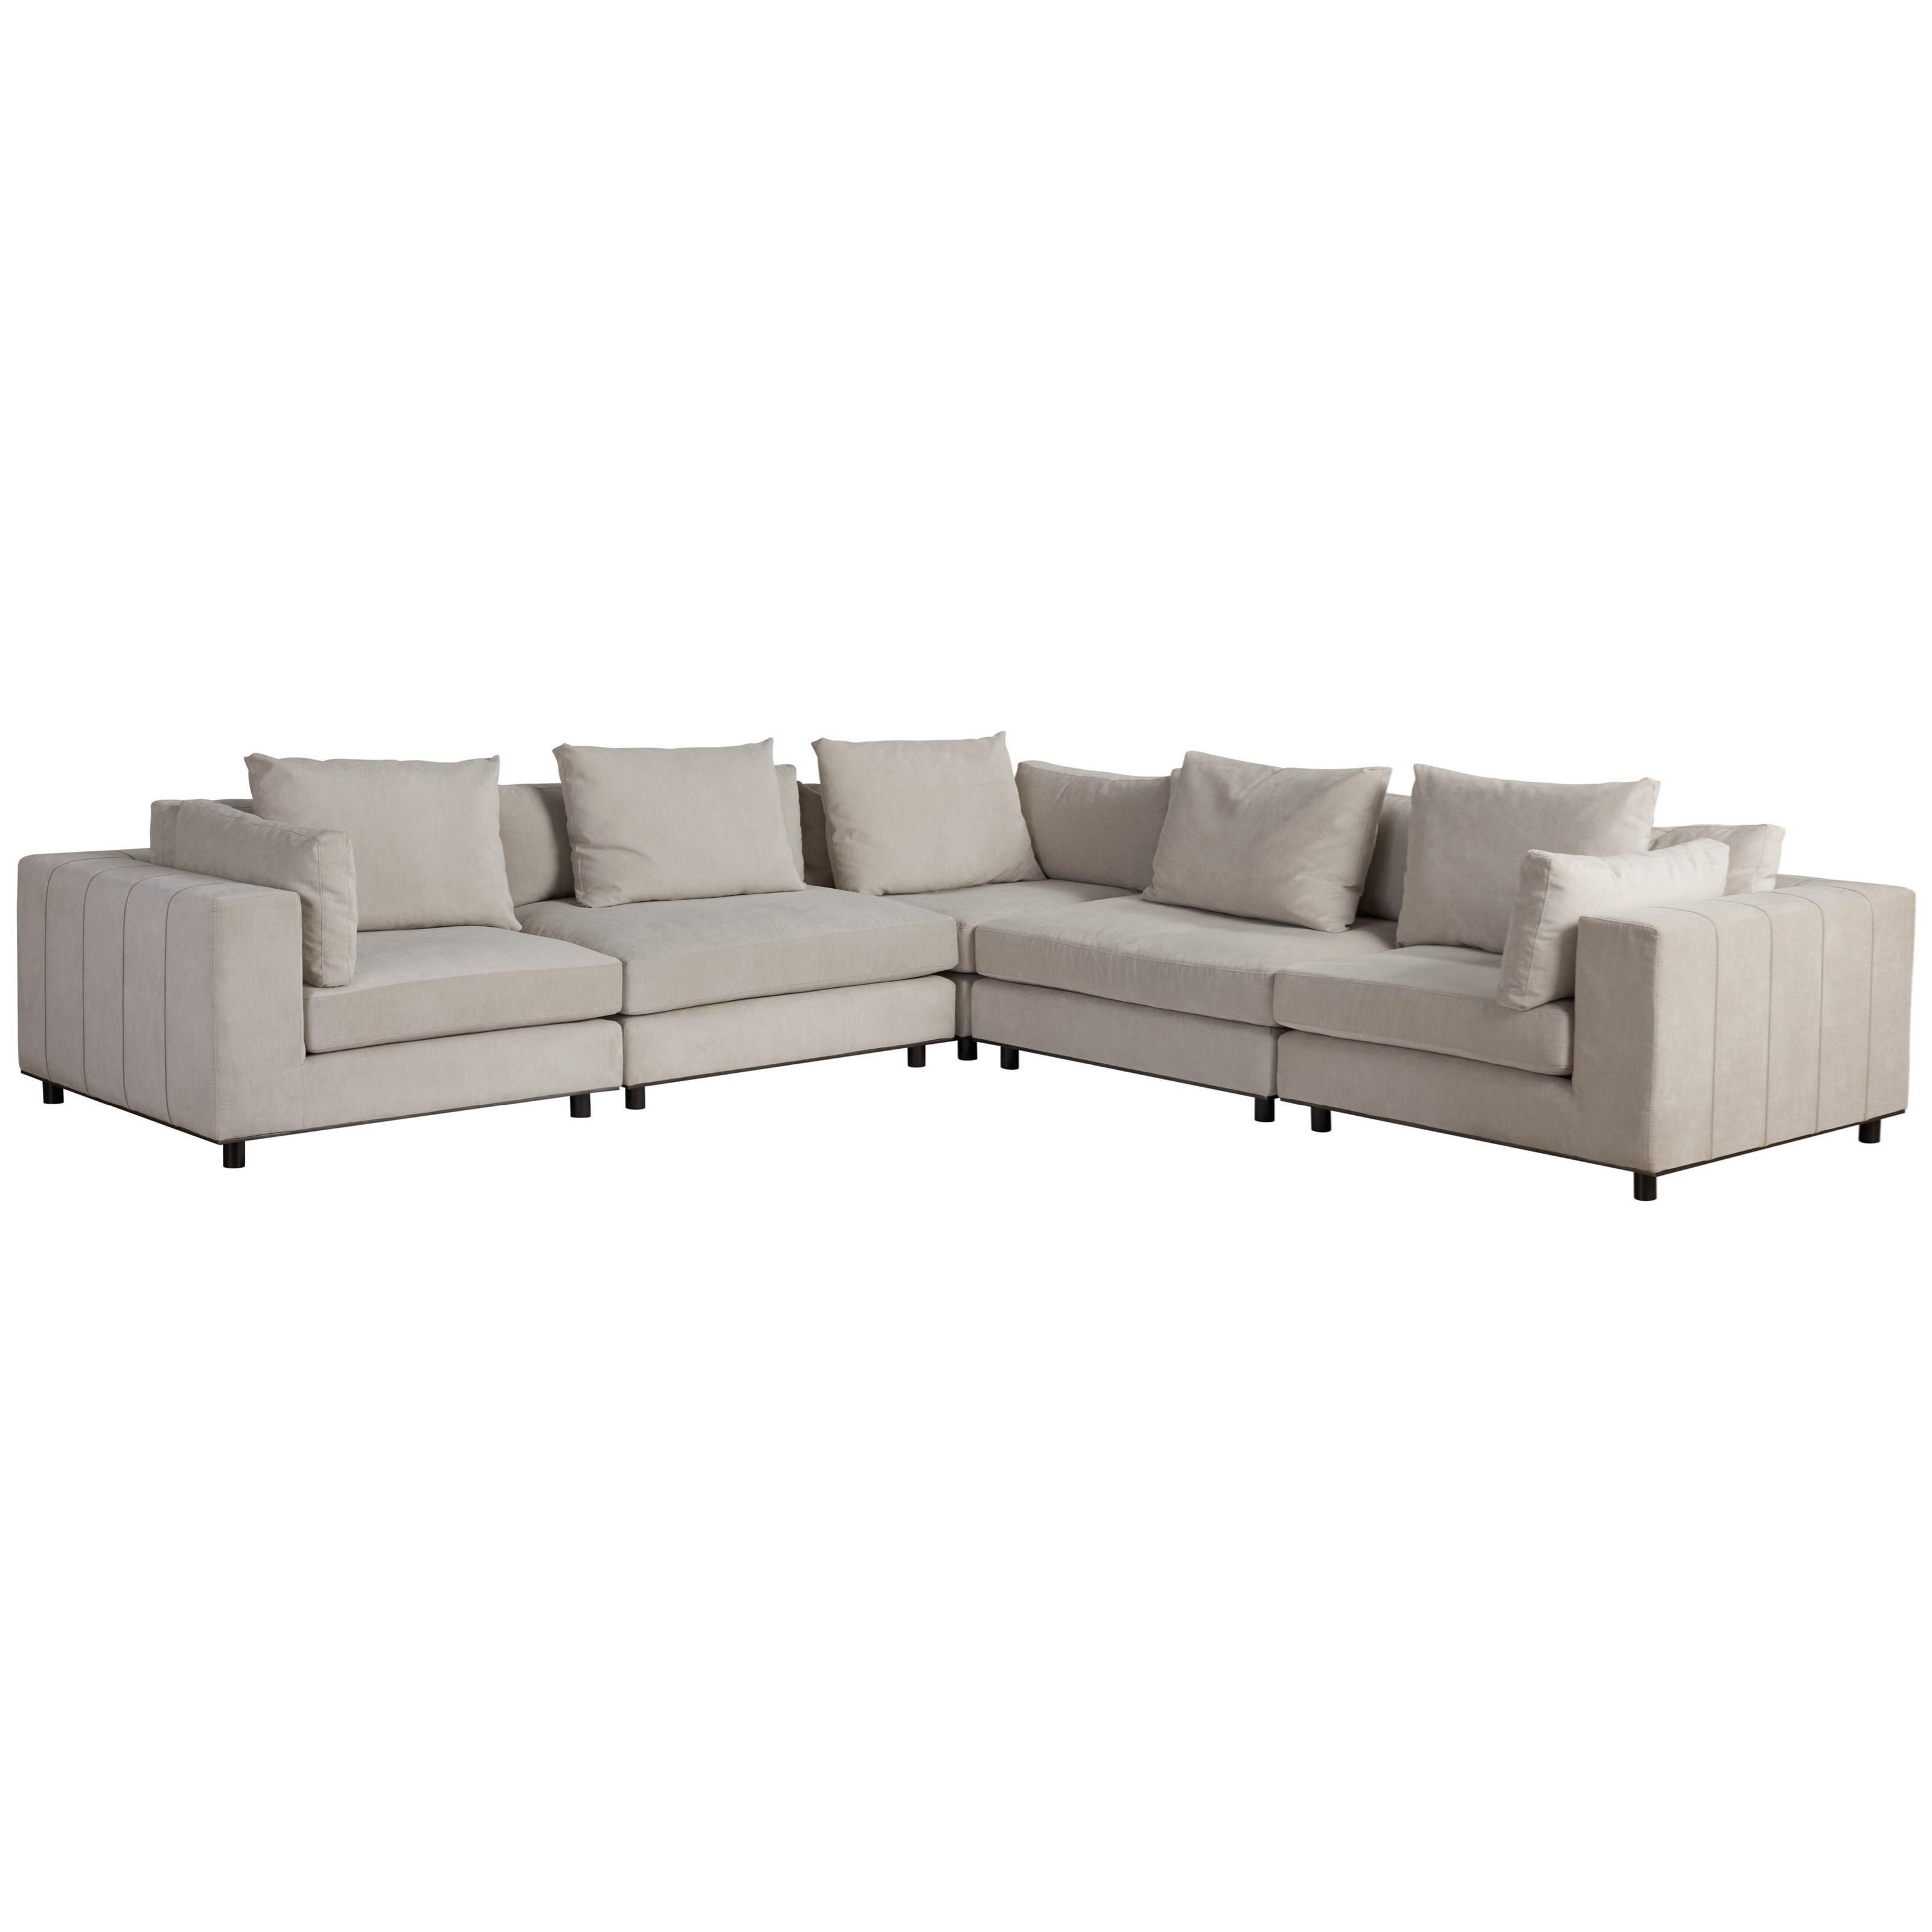 Nina Magon Andorra Sectional by Universal at Baer's Furniture